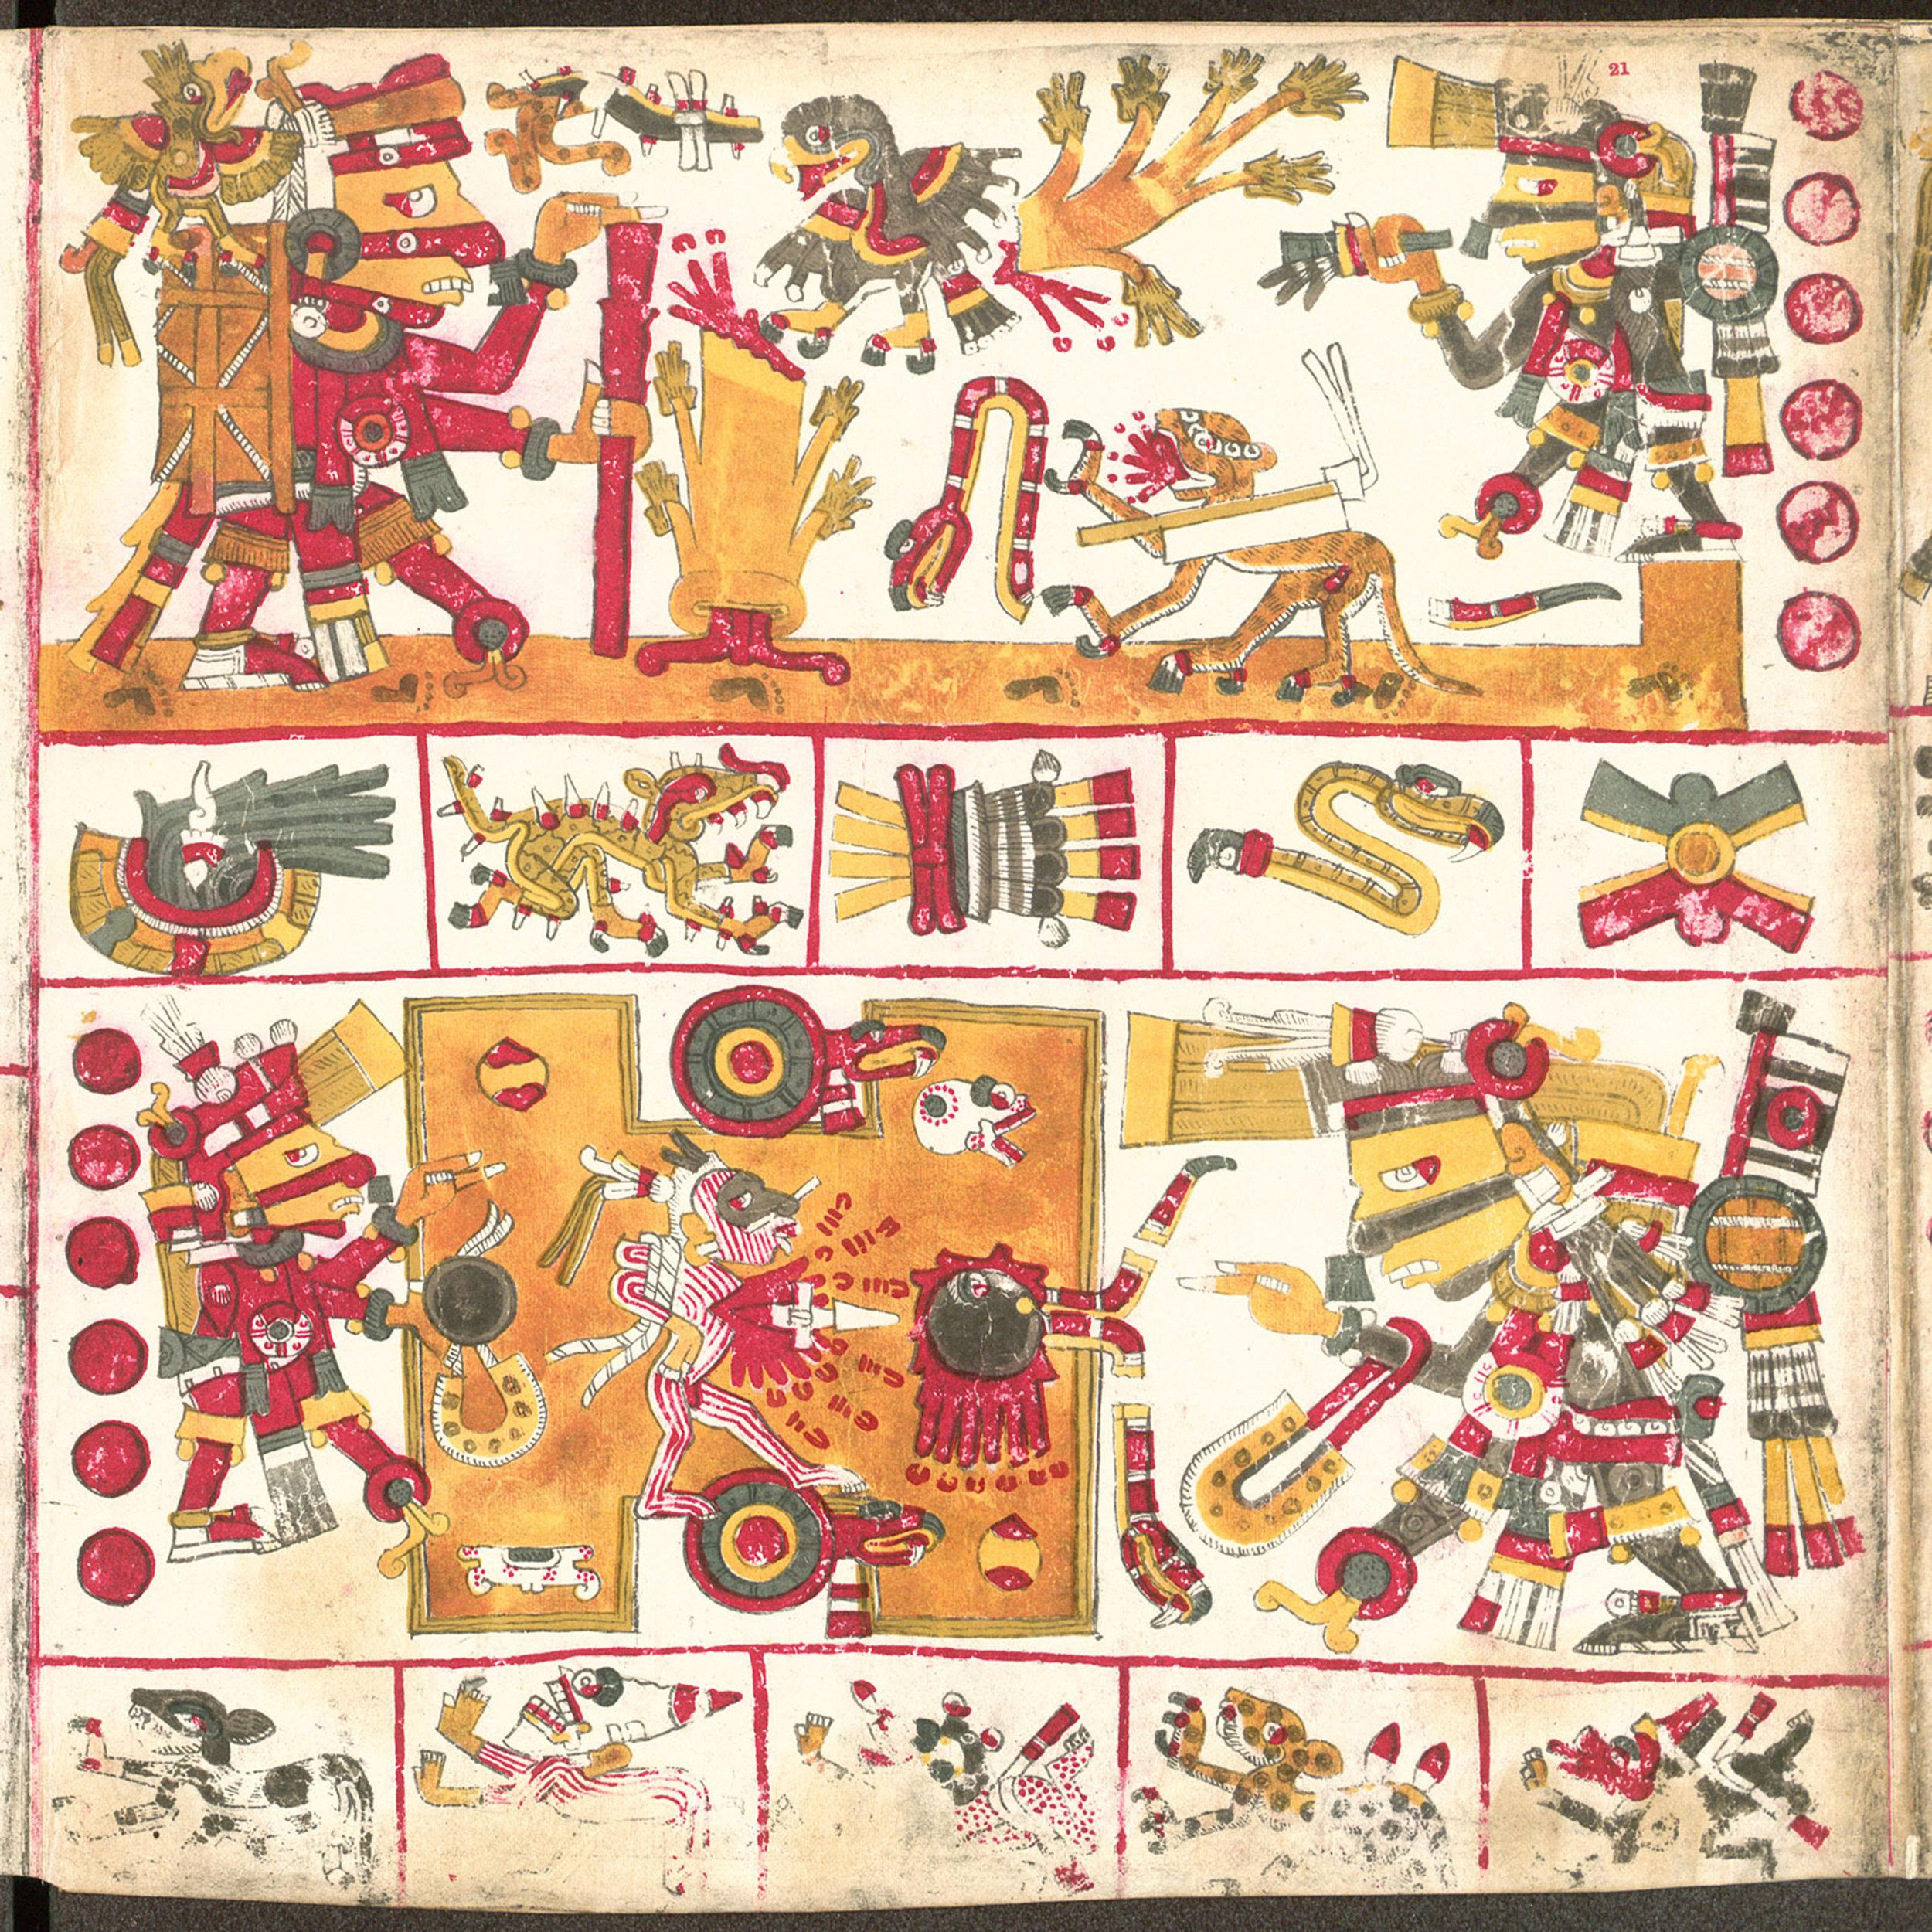 02_Codex_Borgia_pag_21.jpg